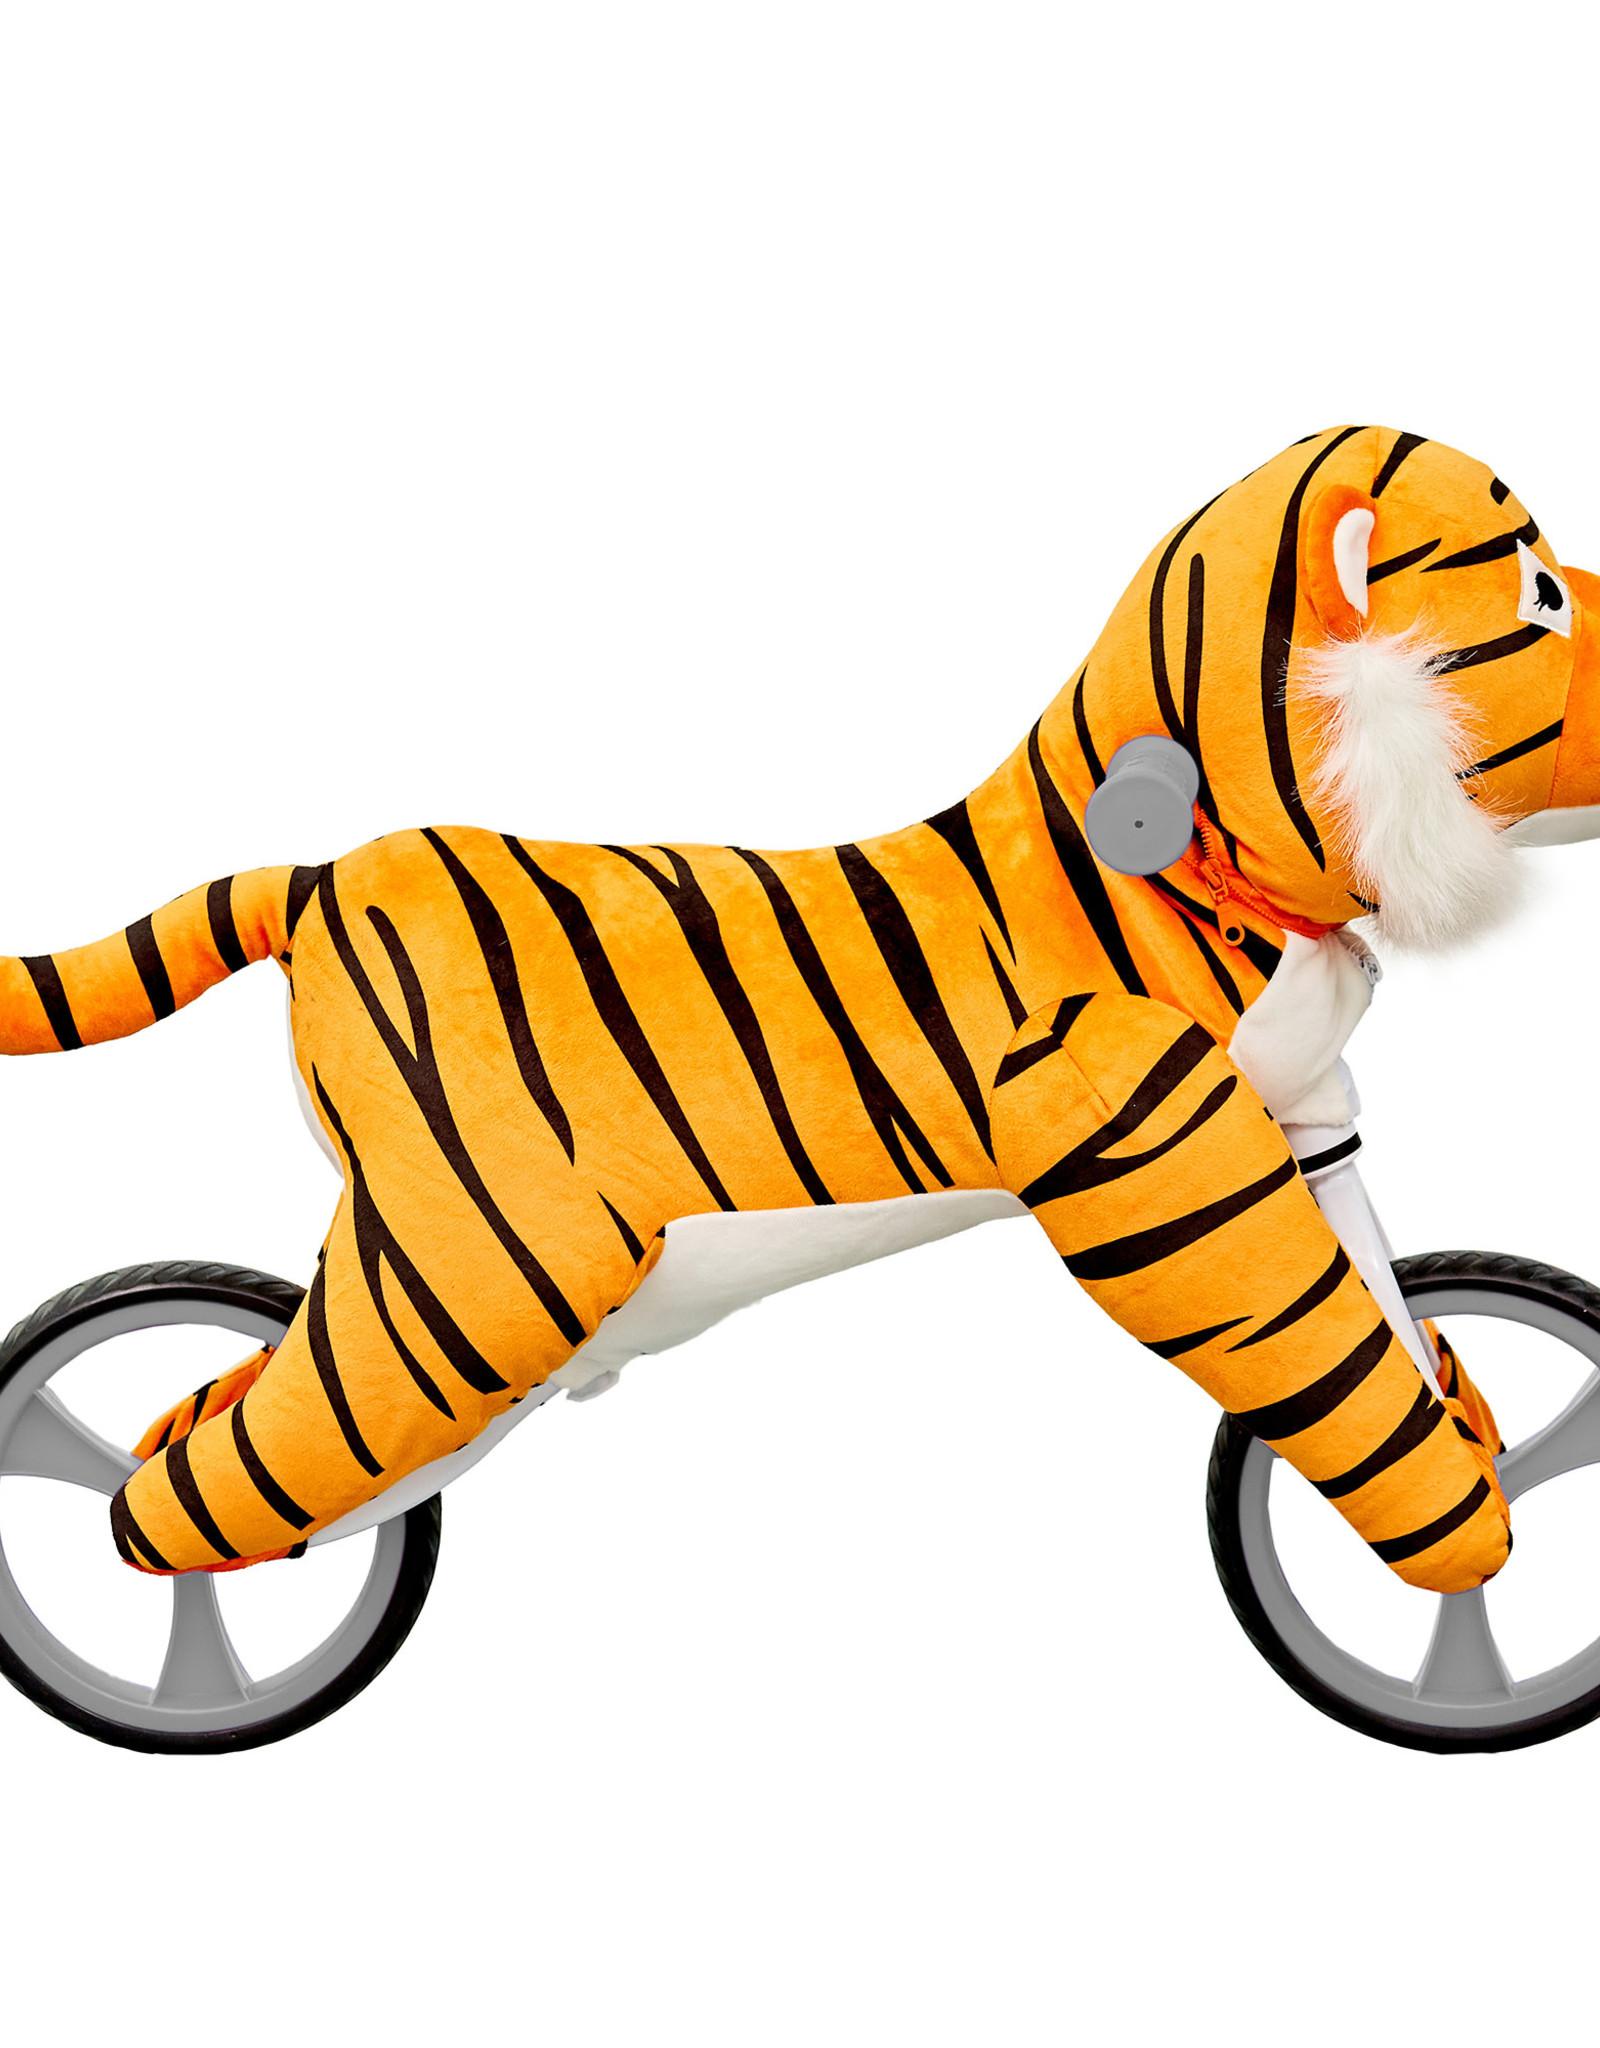 Asweets Tiger Balance Bike